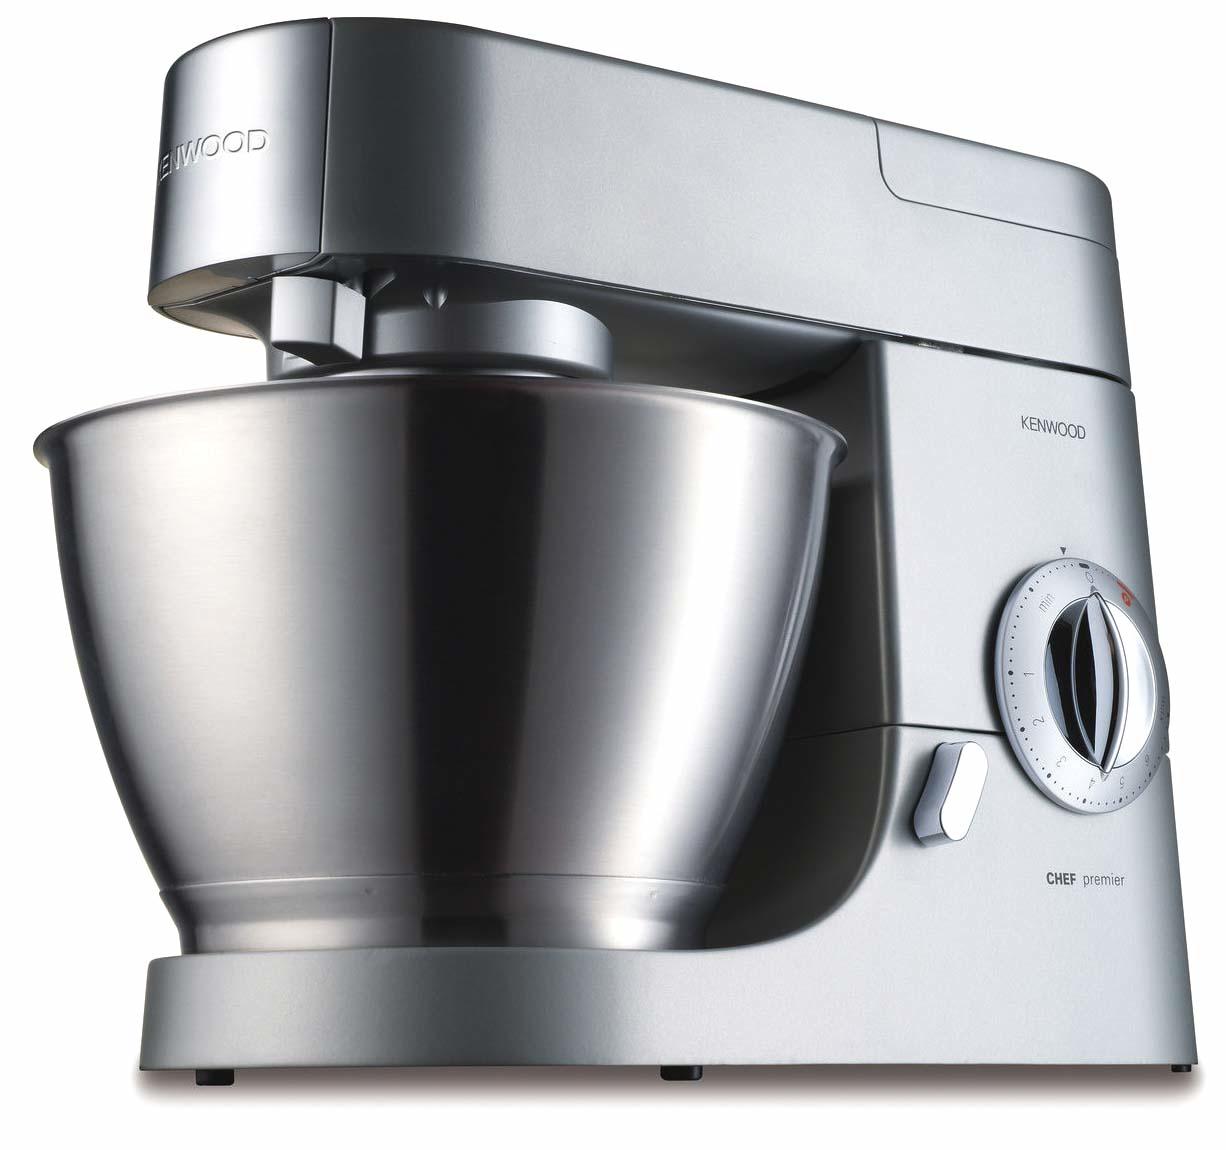 Kenwood Chef Premier KMC 570 – Robot da Cucina